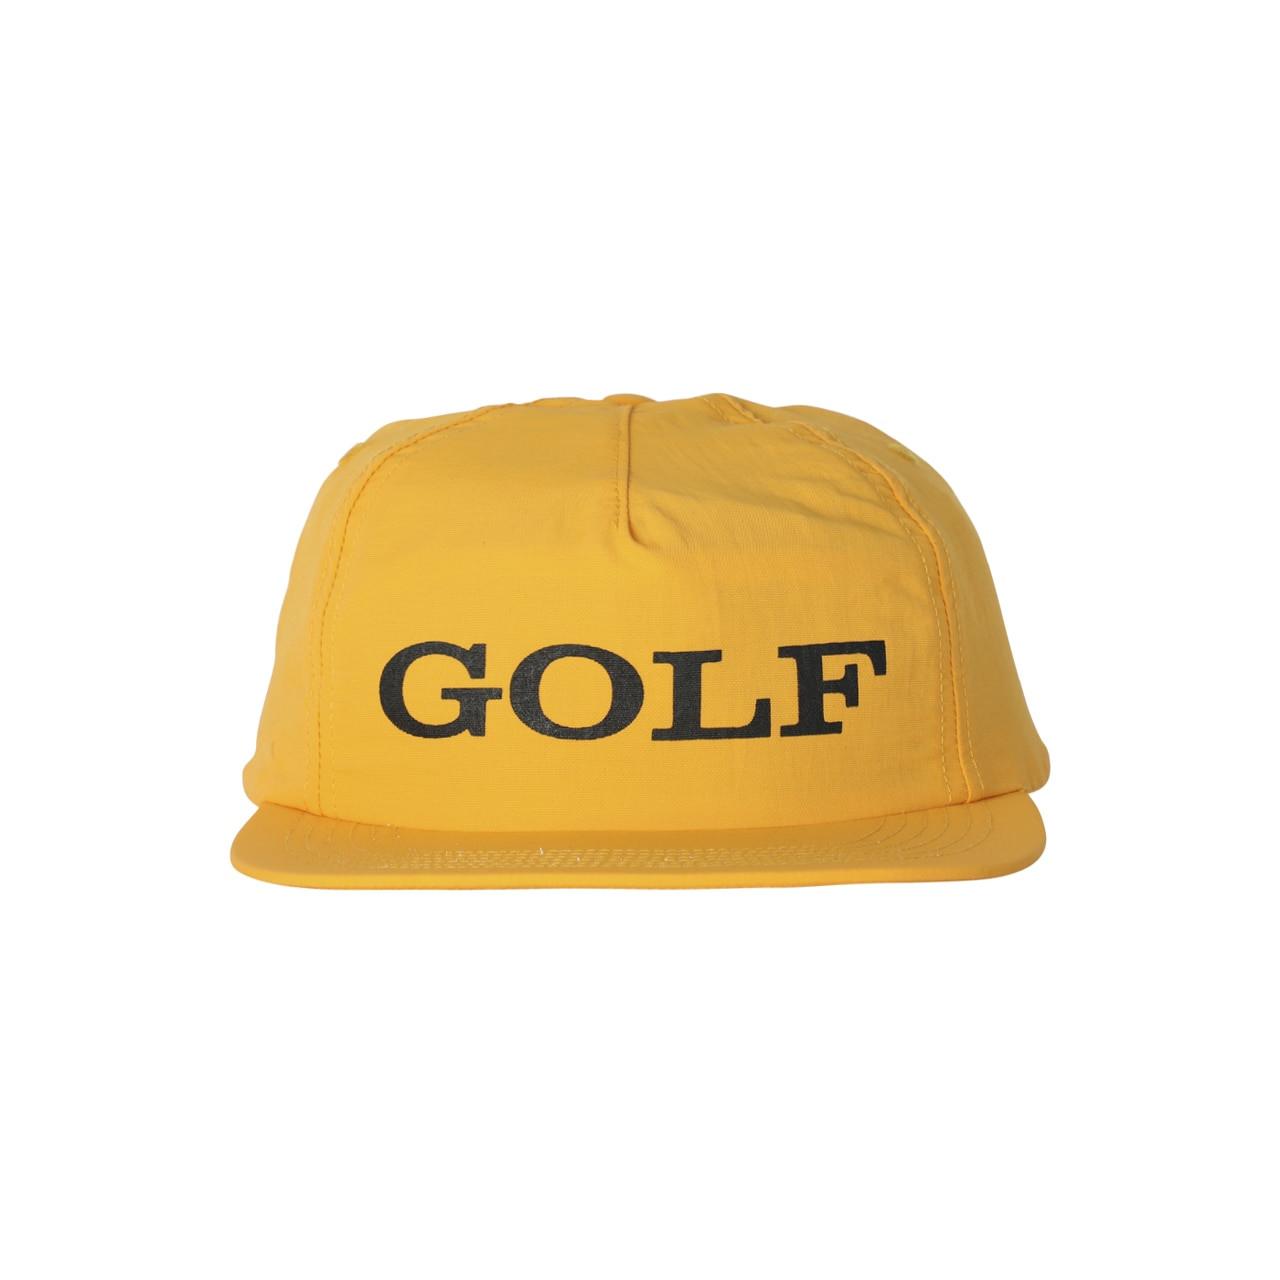 CORPORATE 5 PANEL HAT - YELLOW by GOLF WANG - GOLF WANG db13f49f11d